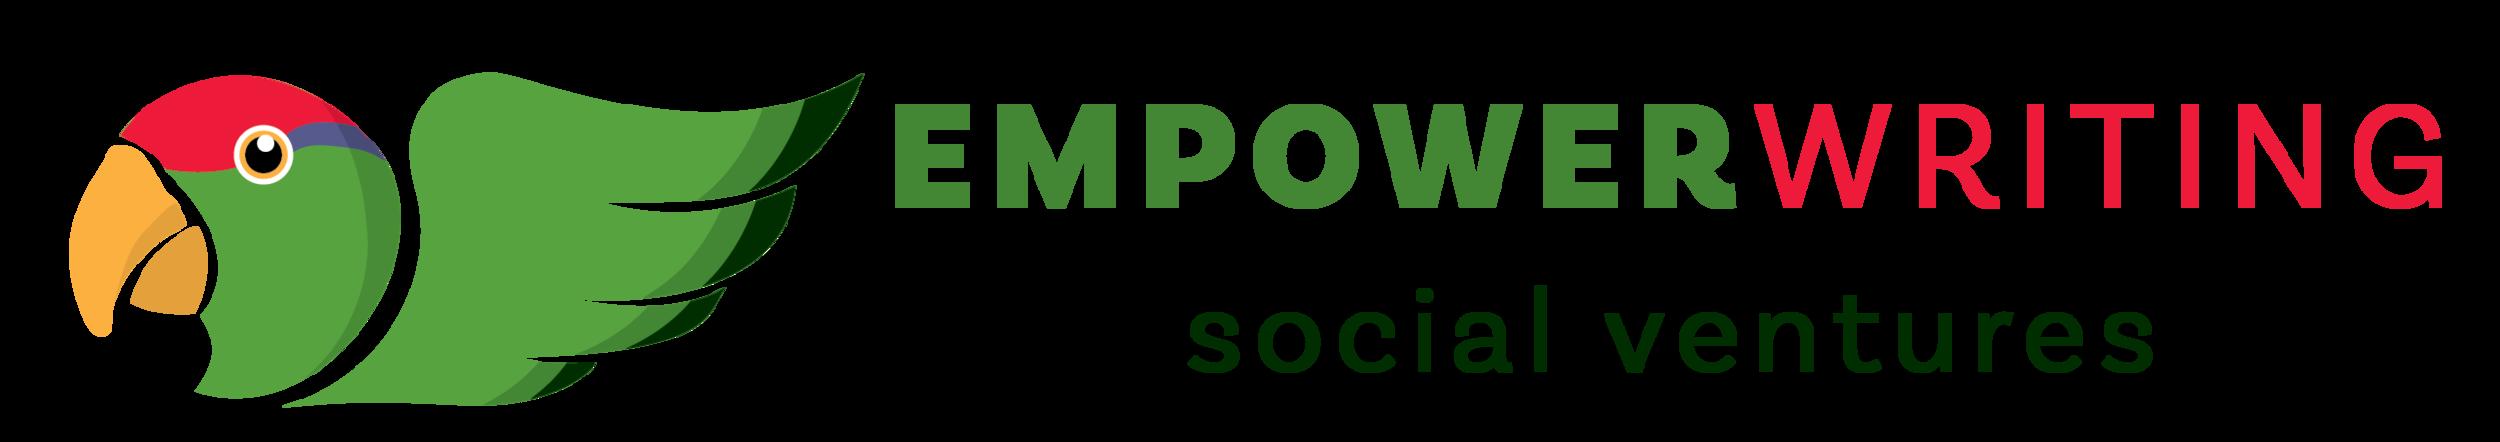 empowerwriting_logo_sv-01_v2-01.png